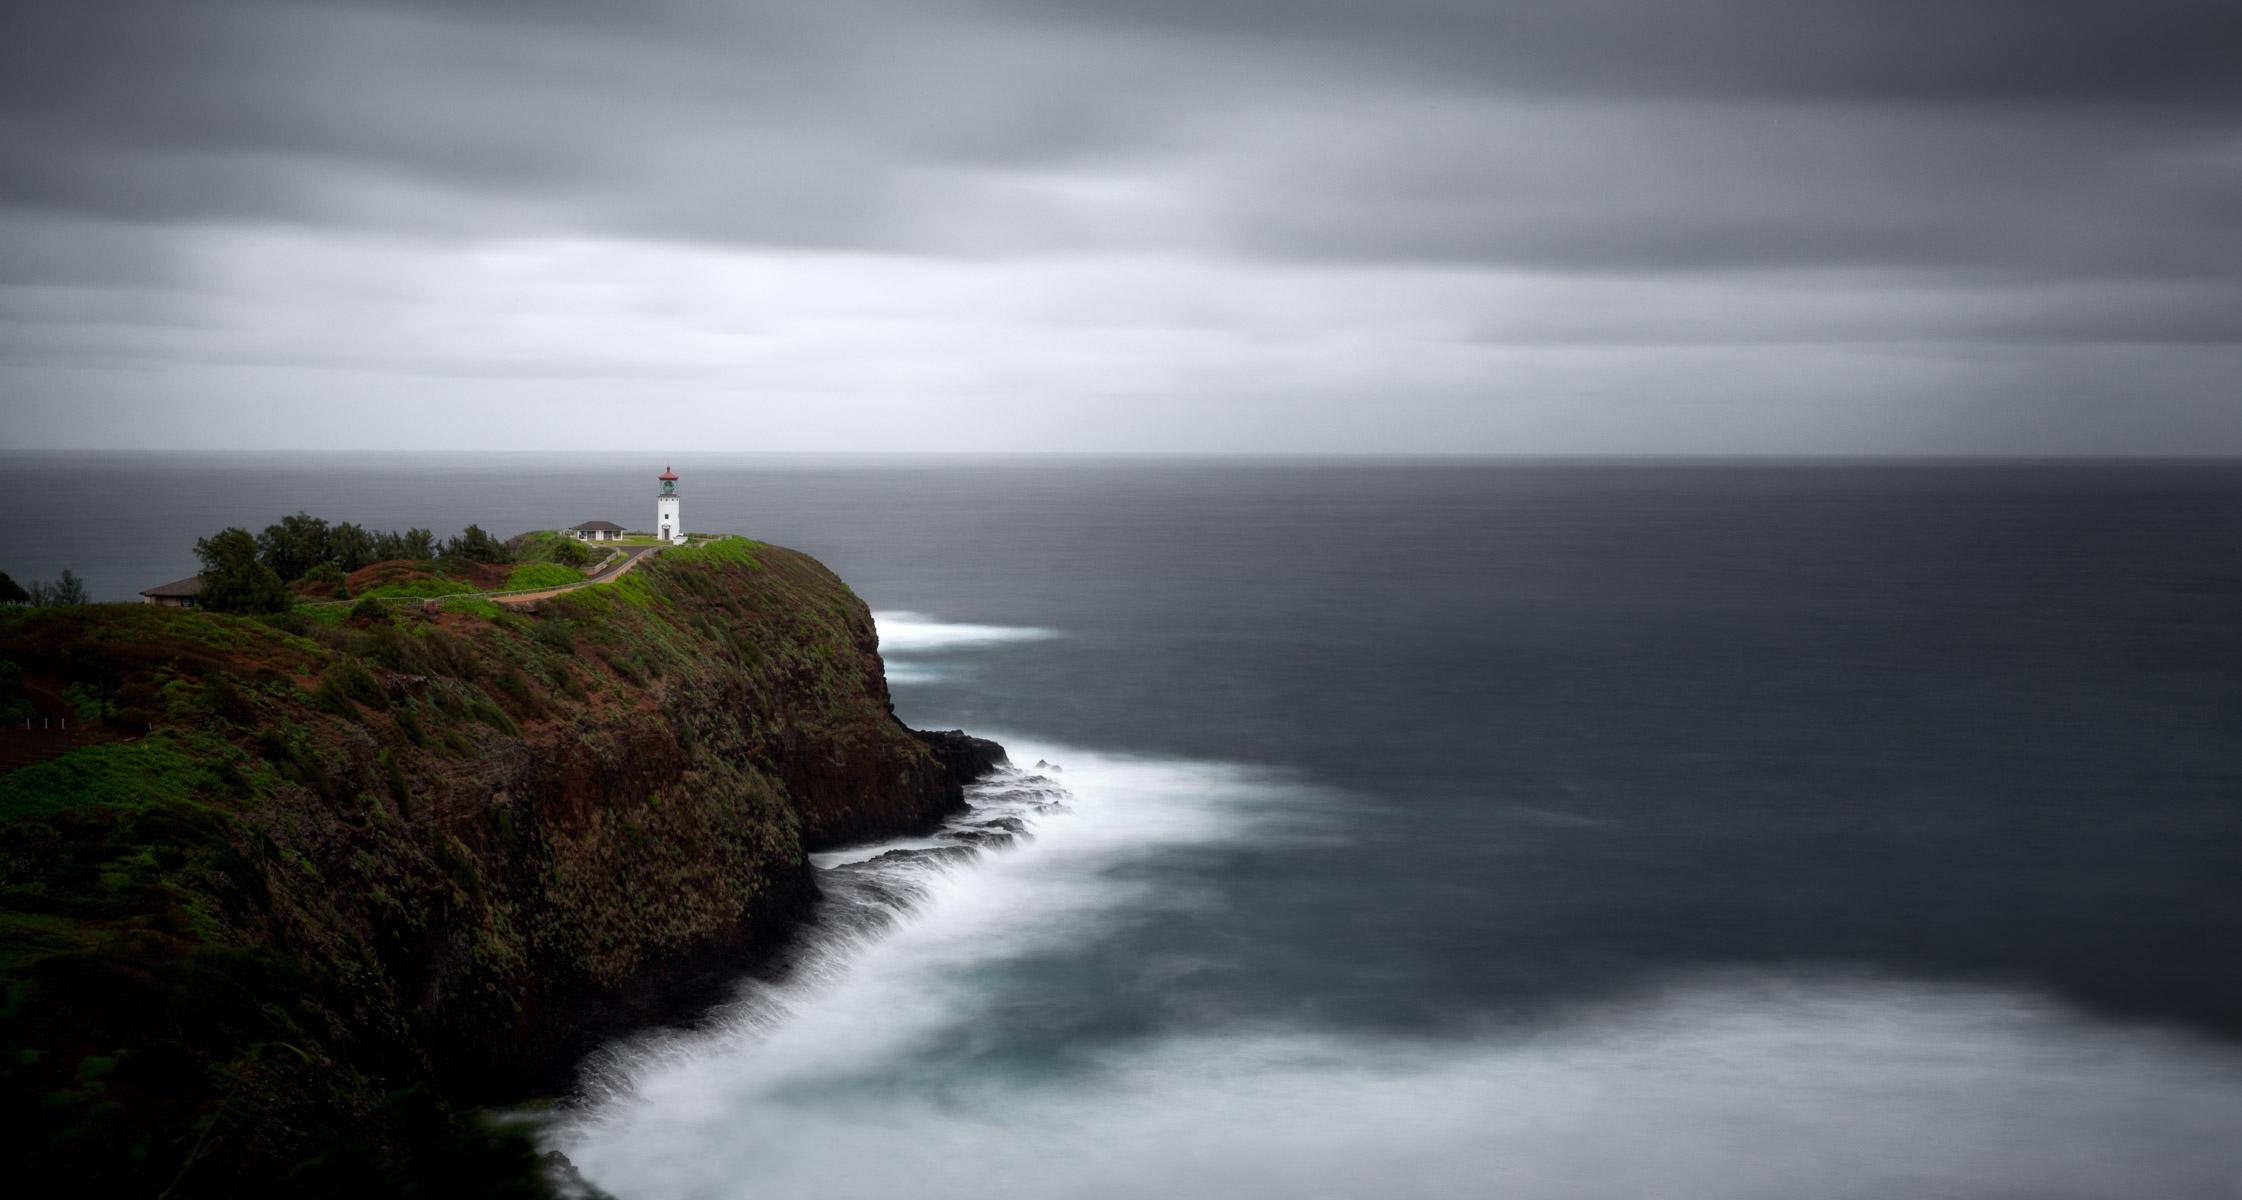 photo-Kīlauea-Lighthouse-kauai-panoramic-nd-filter-big-stopper.jpg